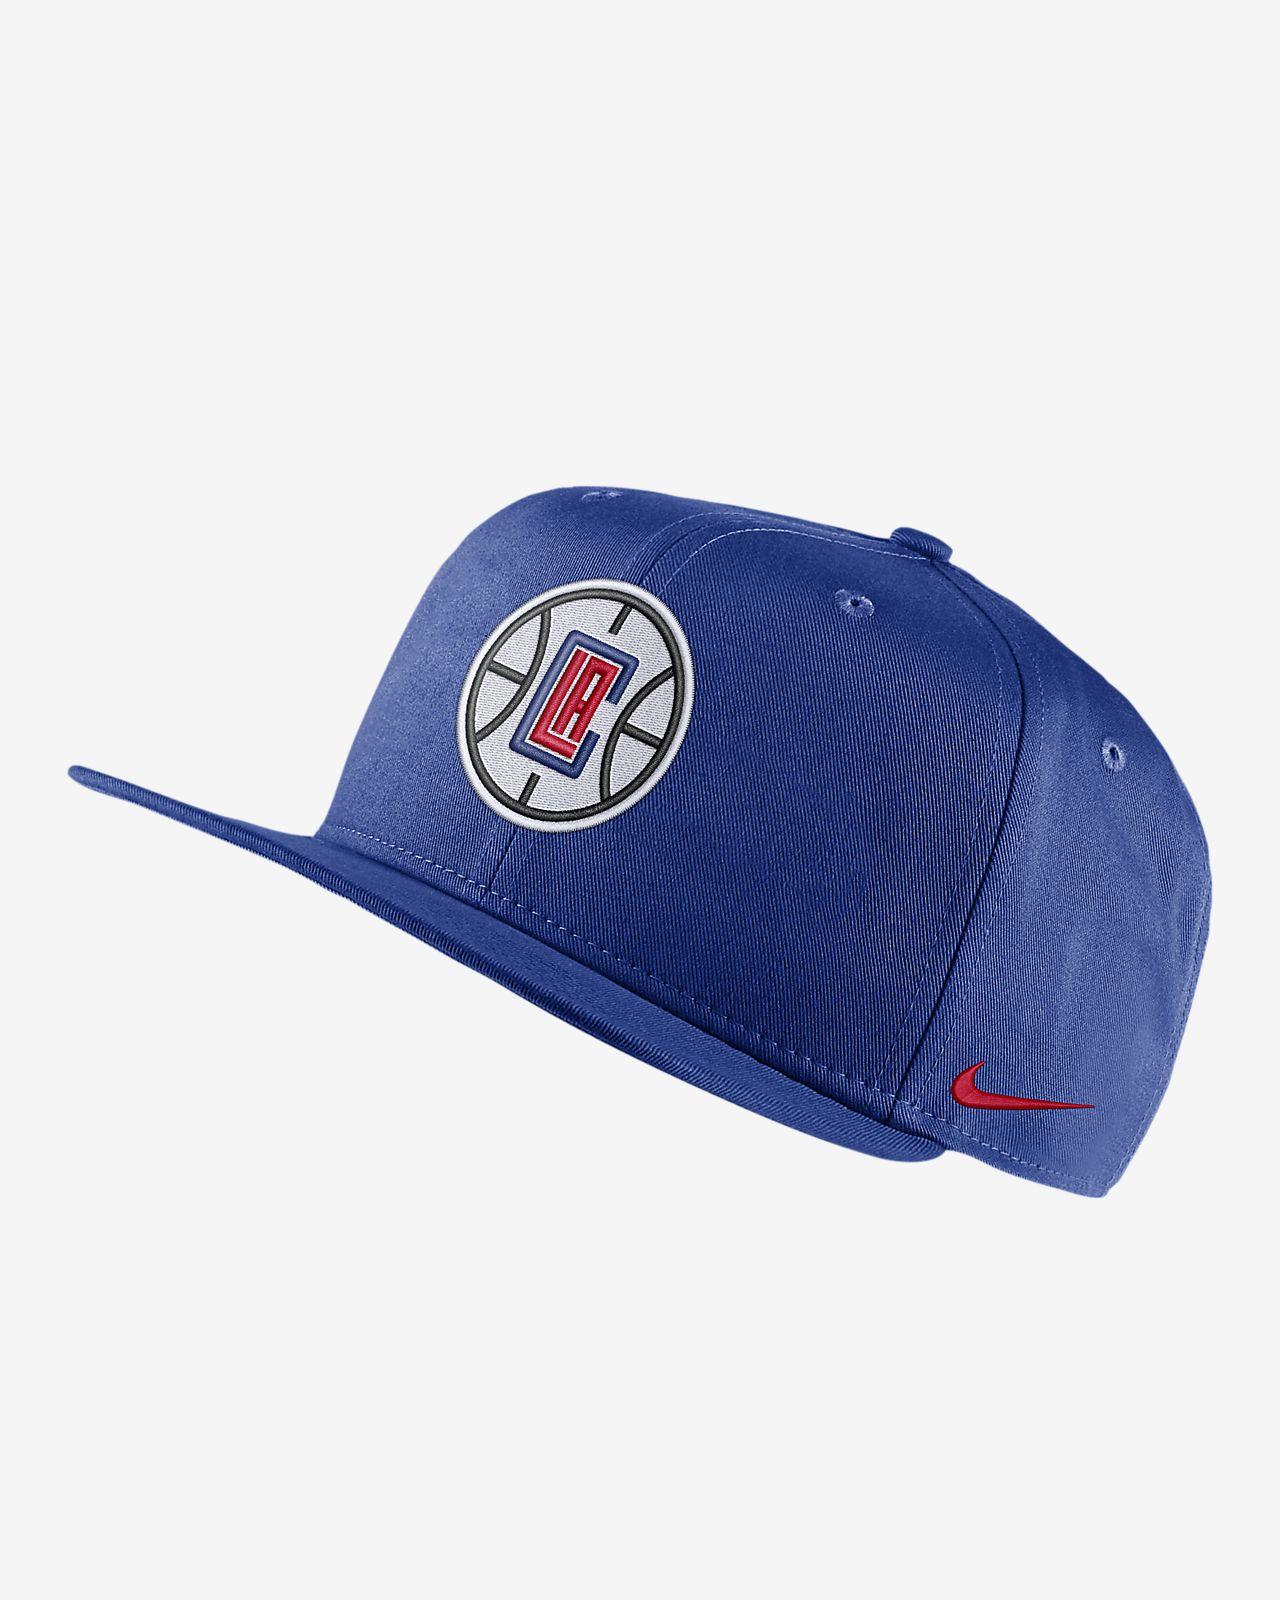 7b3b691792b5 LA Clippers Nike Pro Gorra de la NBA